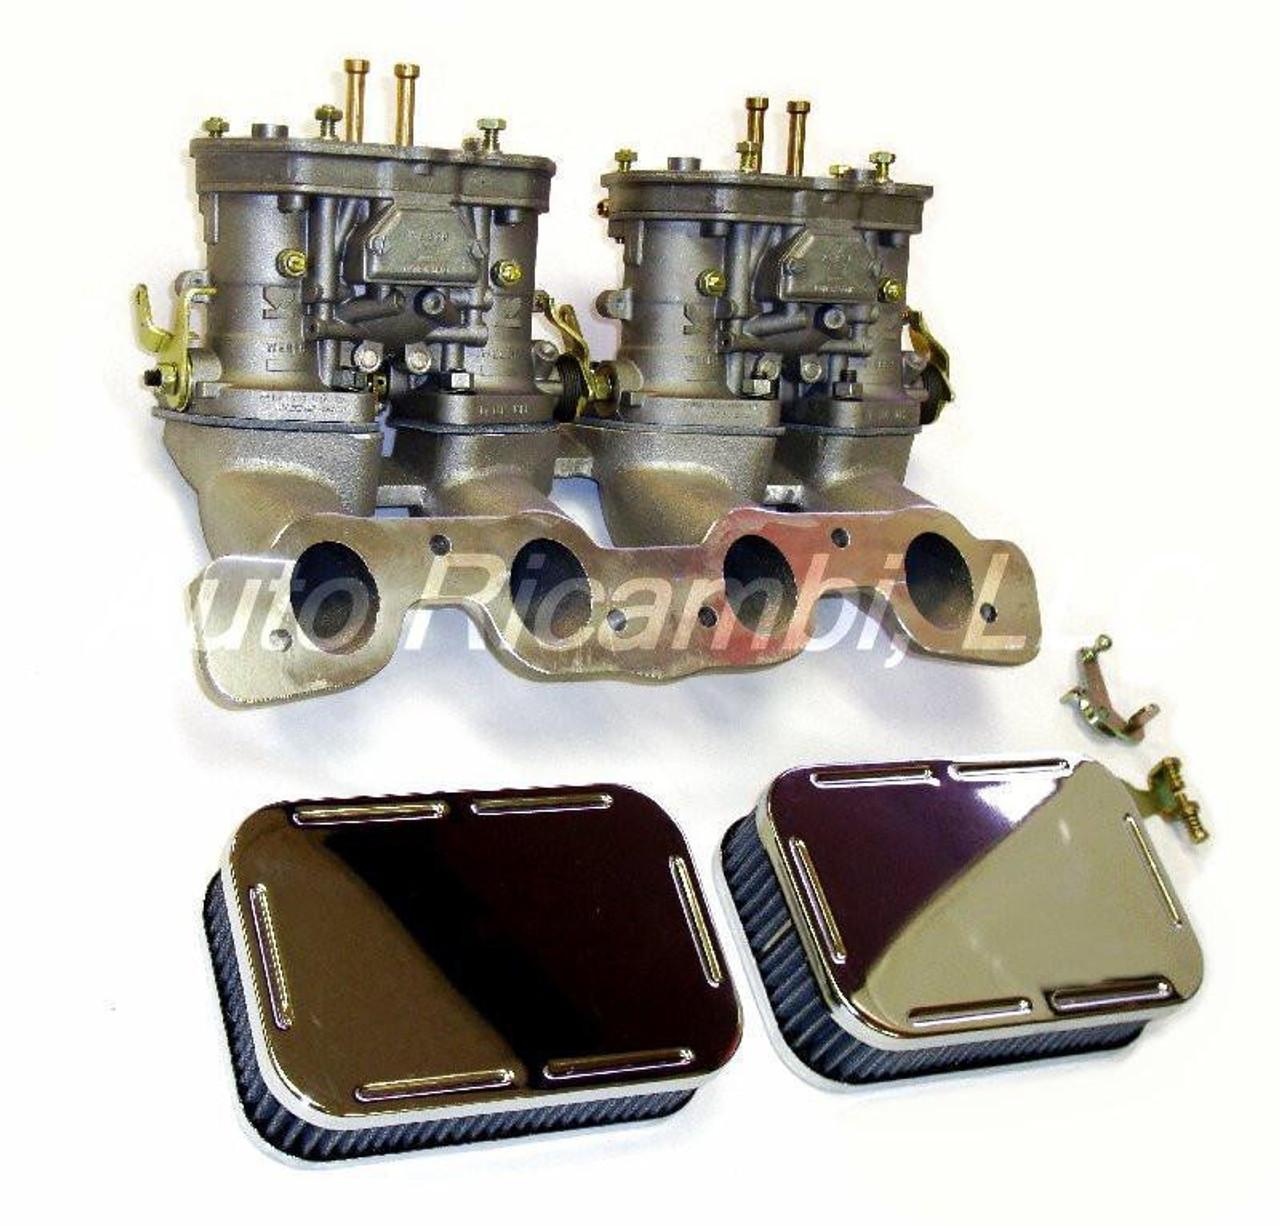 Dual Weber IDF Carburetor Conversion Kit